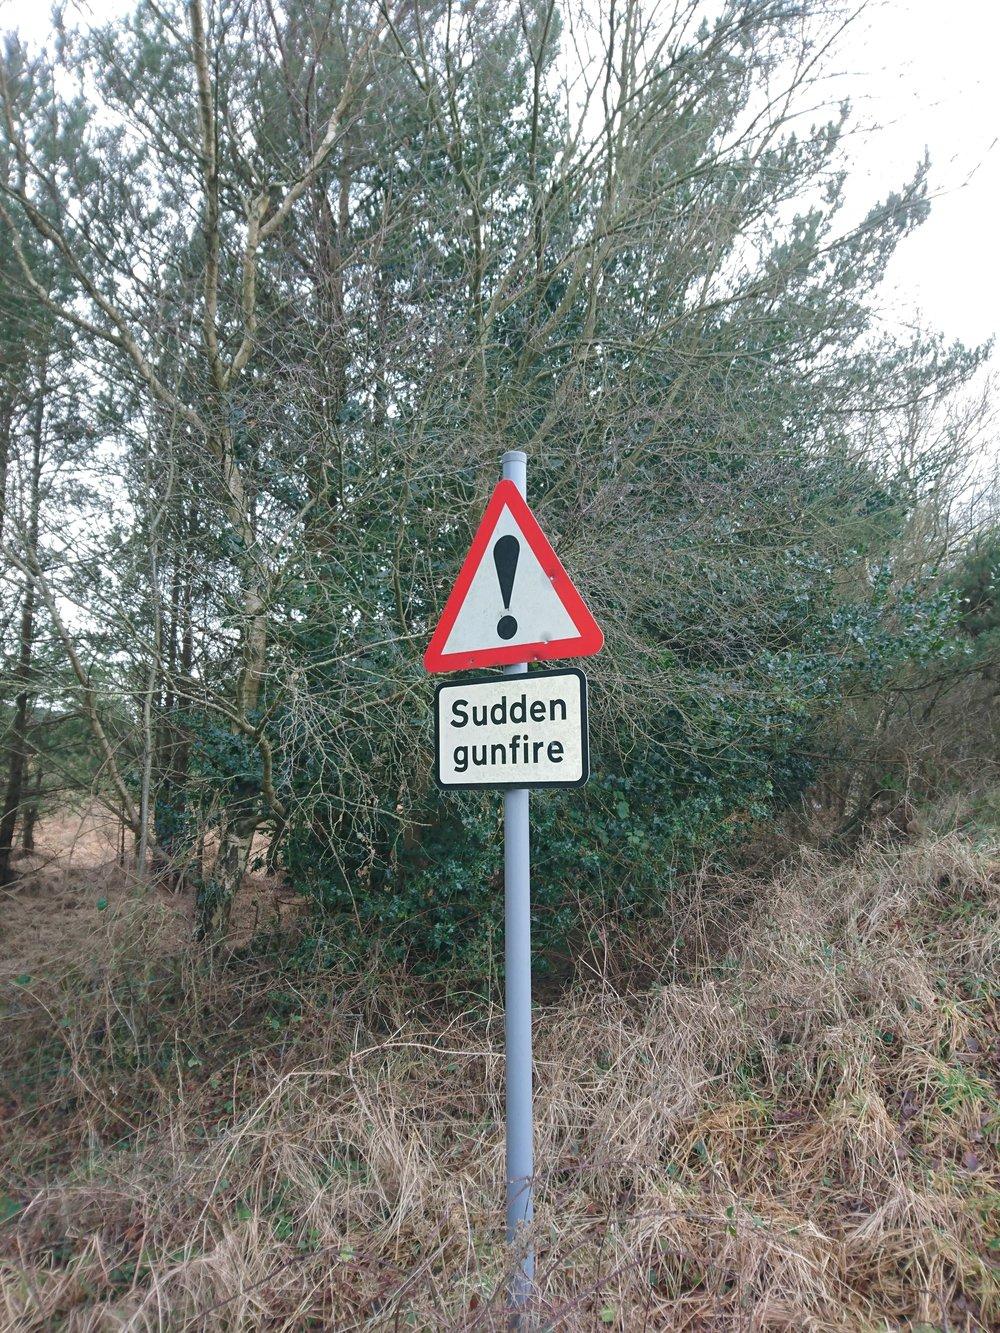 Slightly Disconcerting Sign